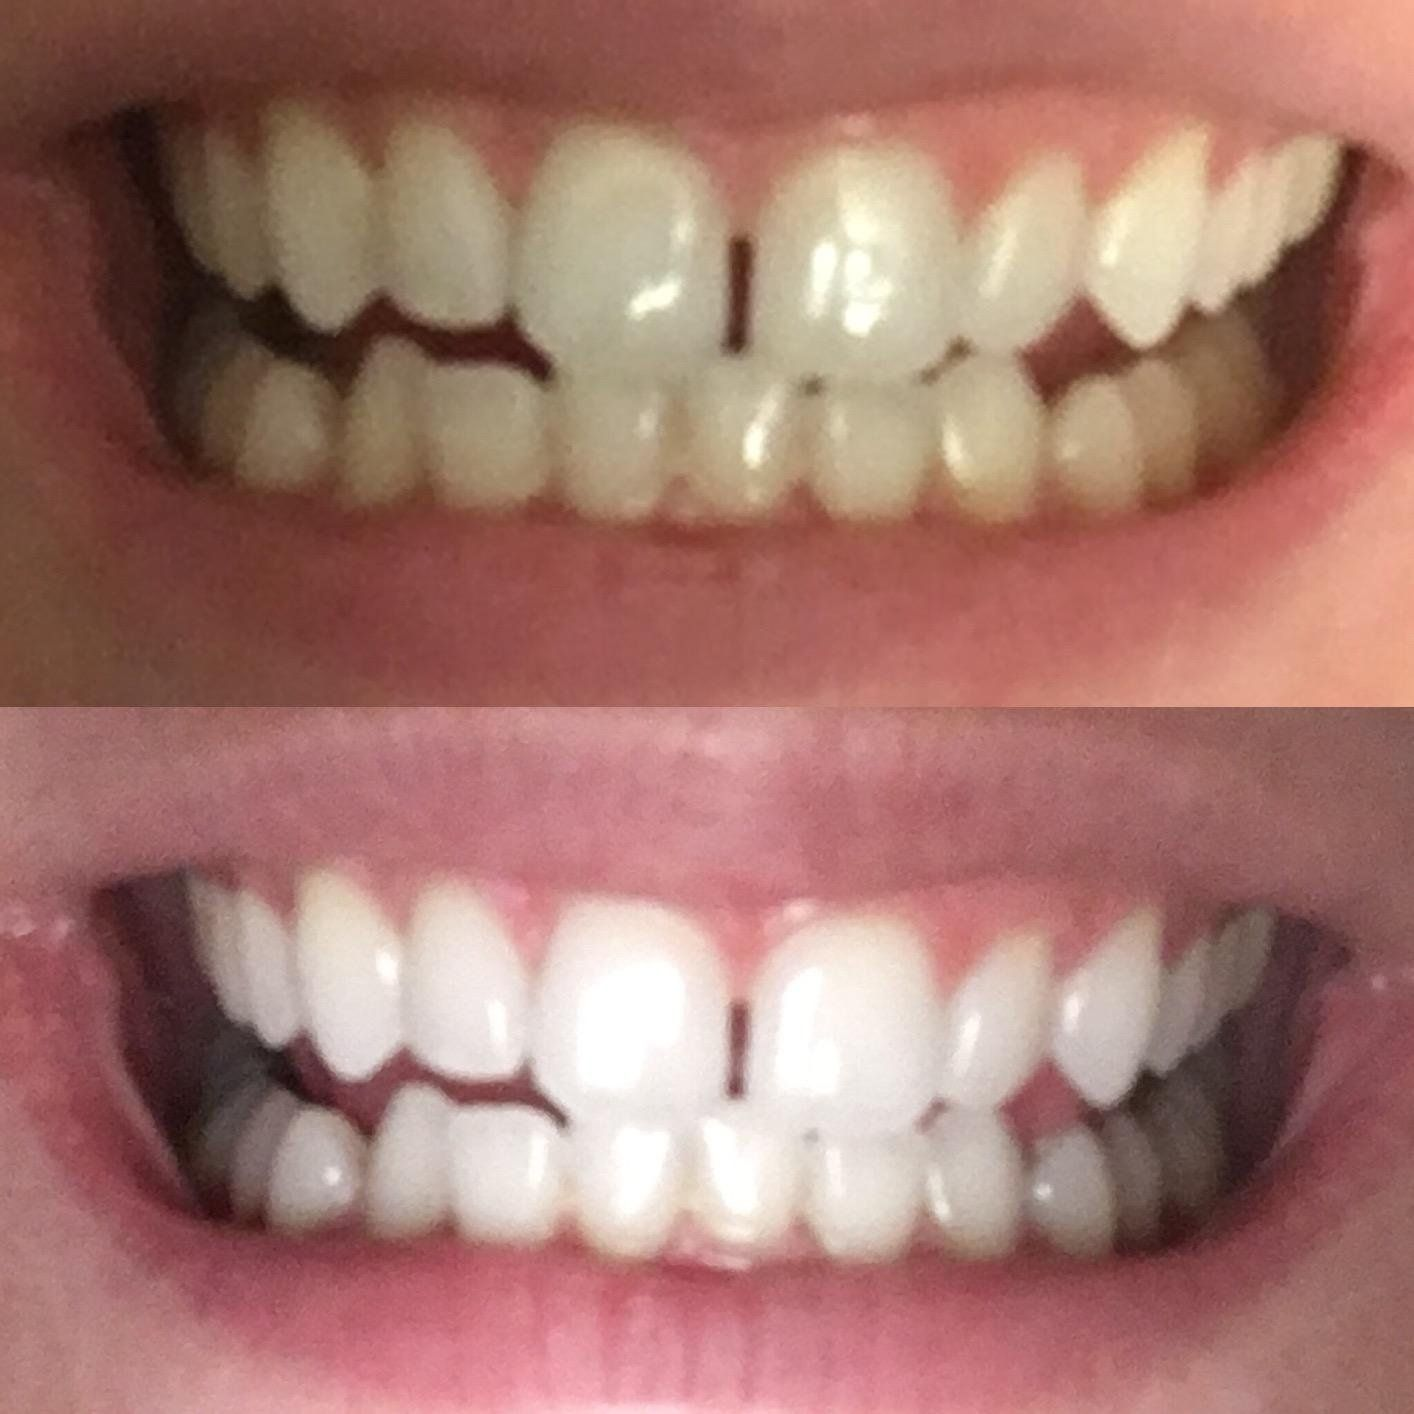 Pin On Fast Teeth Whitening